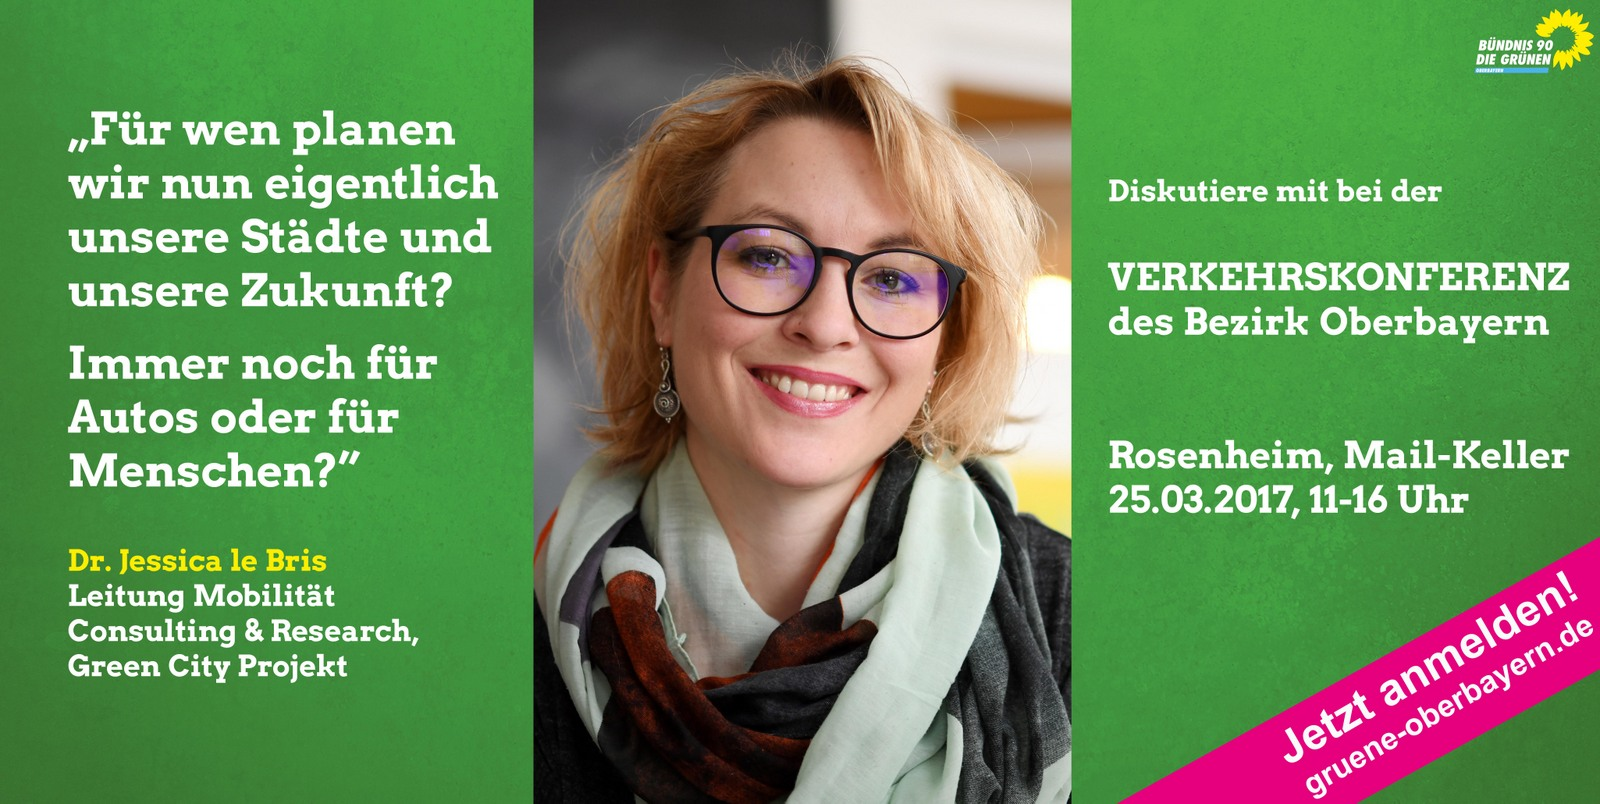 http://gruene-oberbayern.de/wp-content/uploads/2017/03/SharepicVerkehr_le_bris-002.jpg